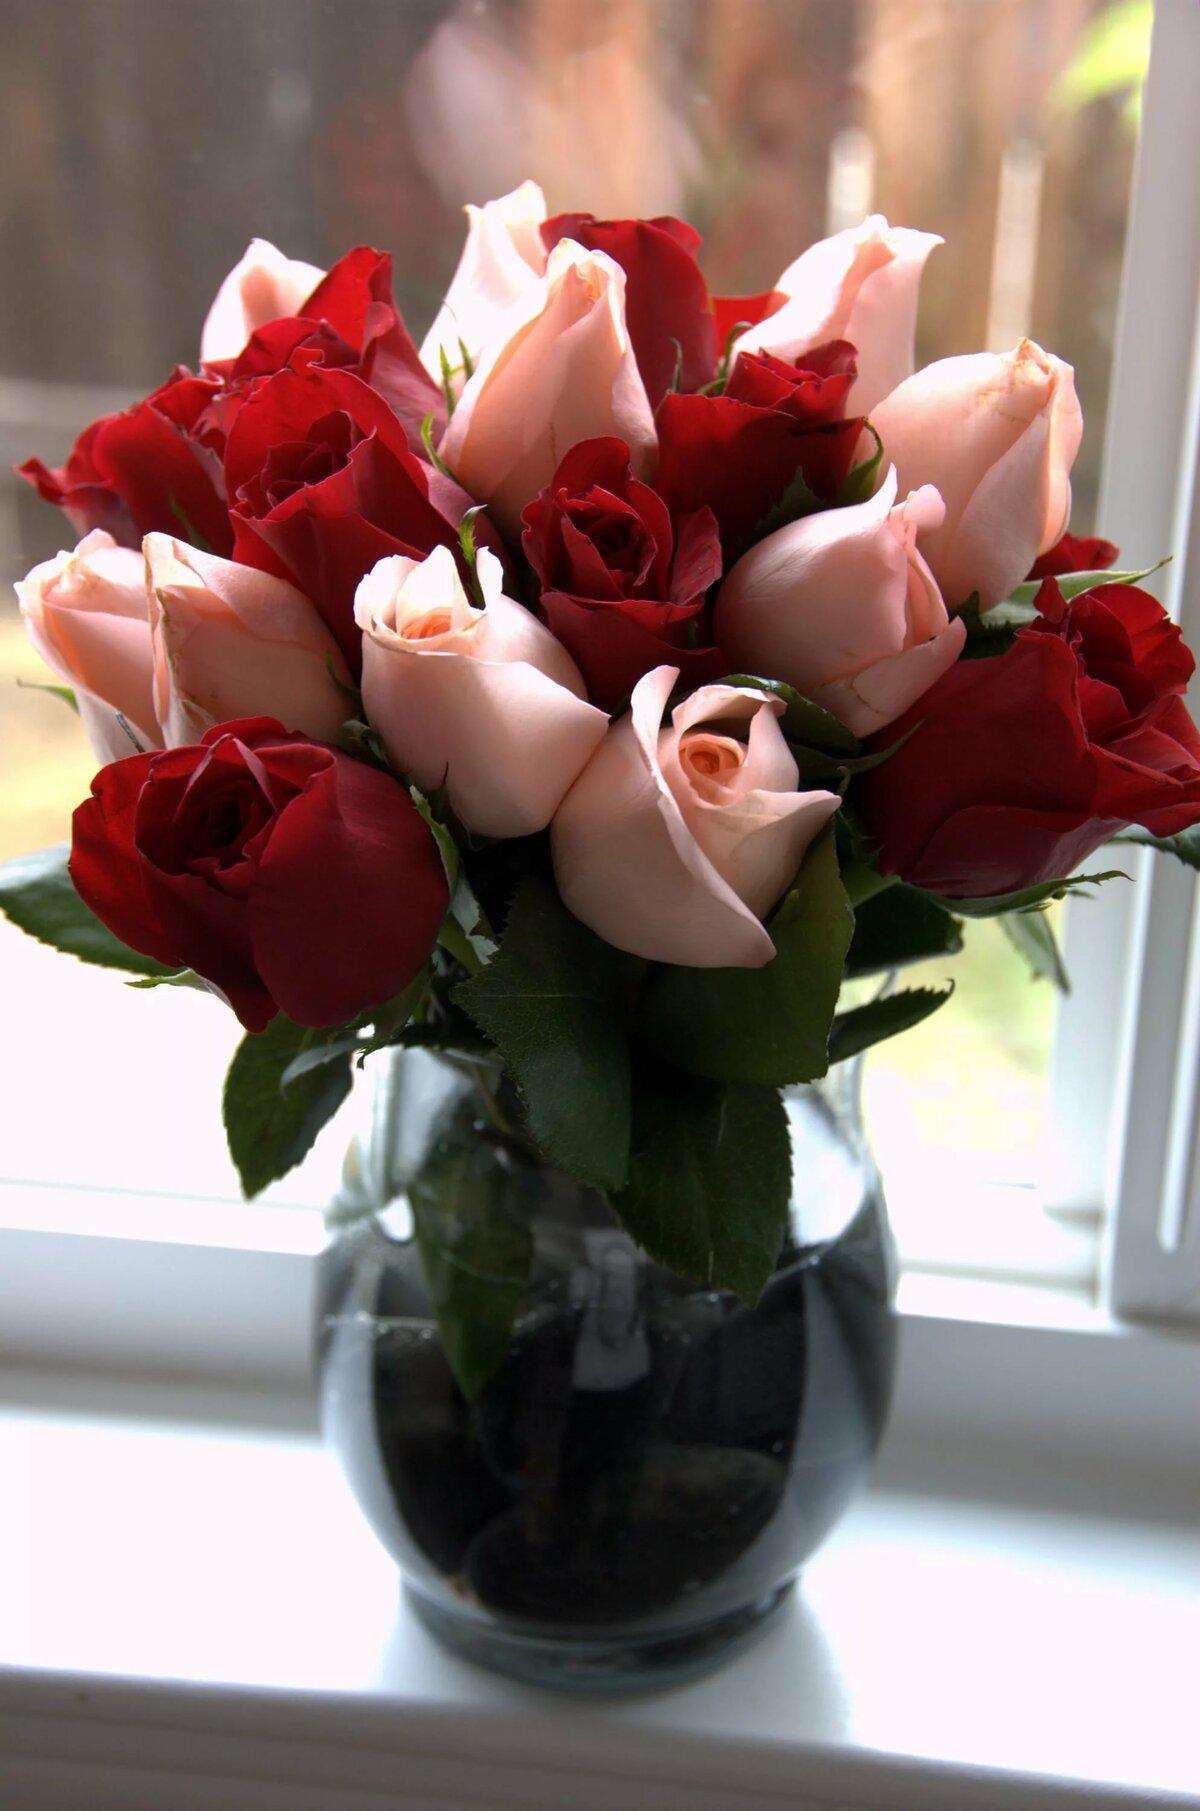 могут фото цветов на столе дома подобных мест